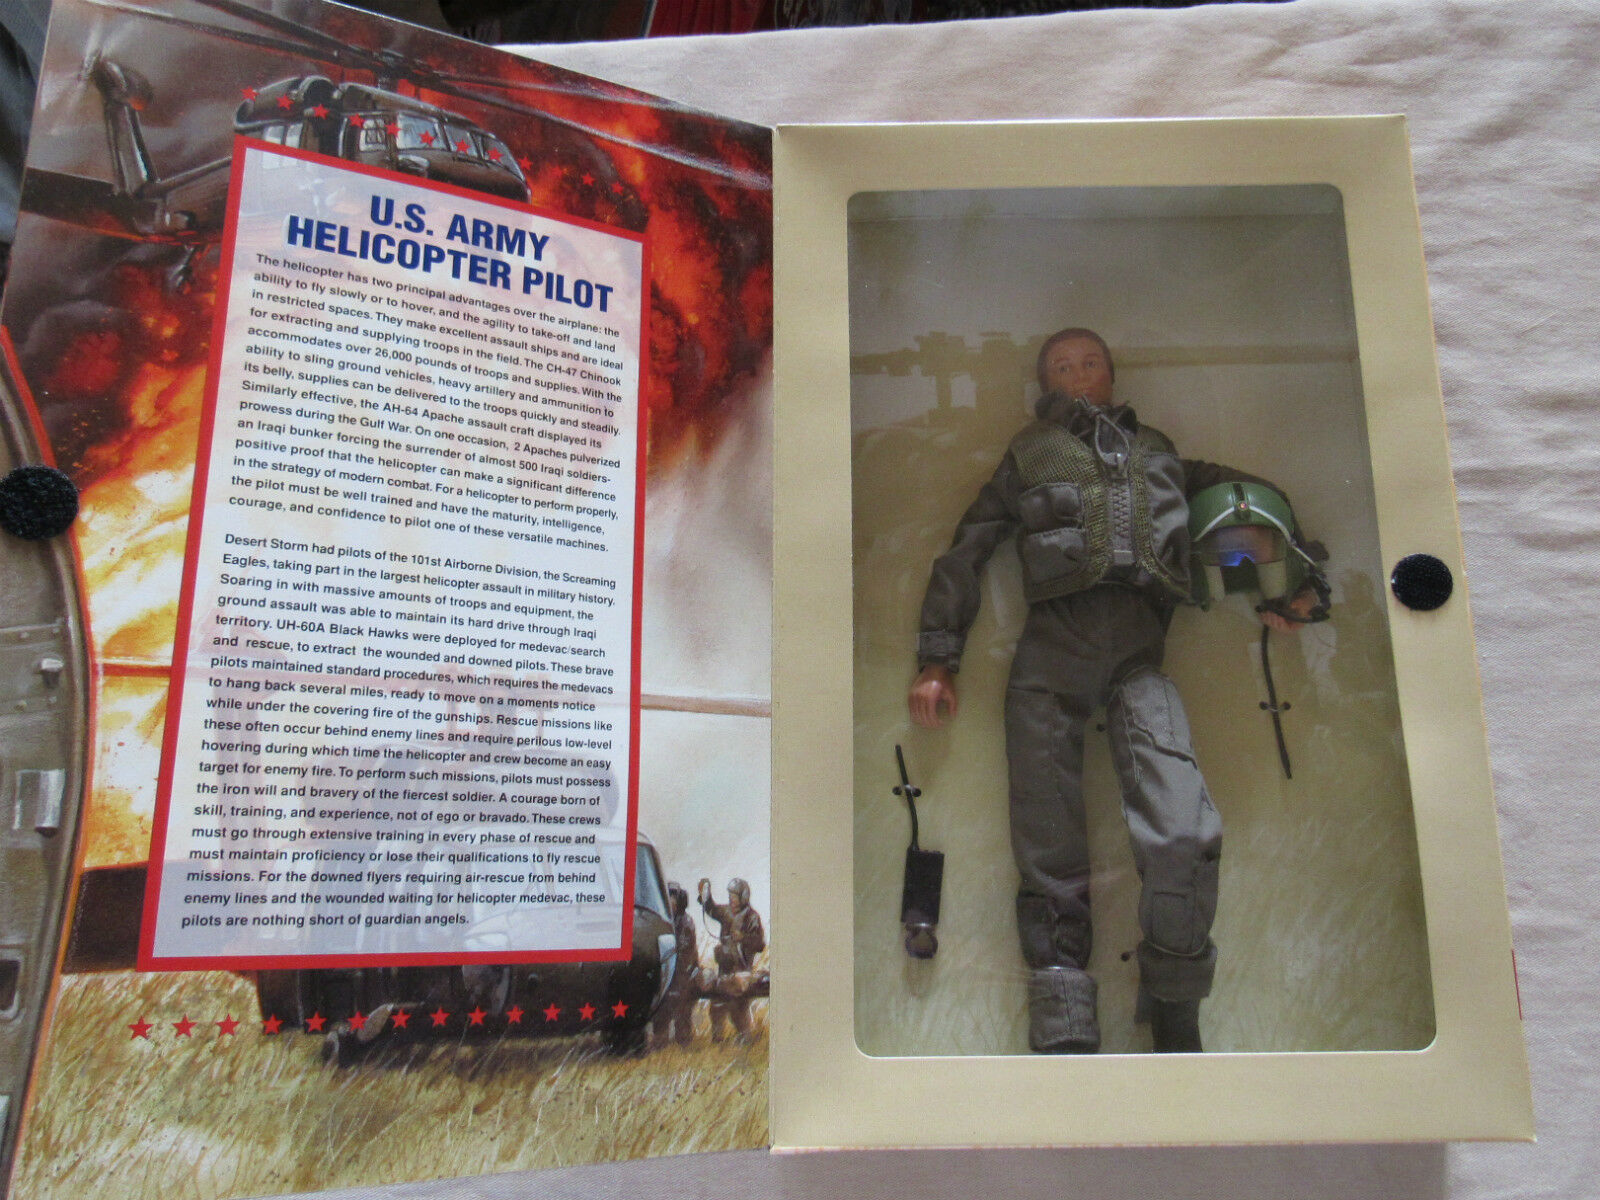 NRFB 1997 GI Joe Classic Collection GI Jane Helicopter Pilot RED HAIR Ltd Ed